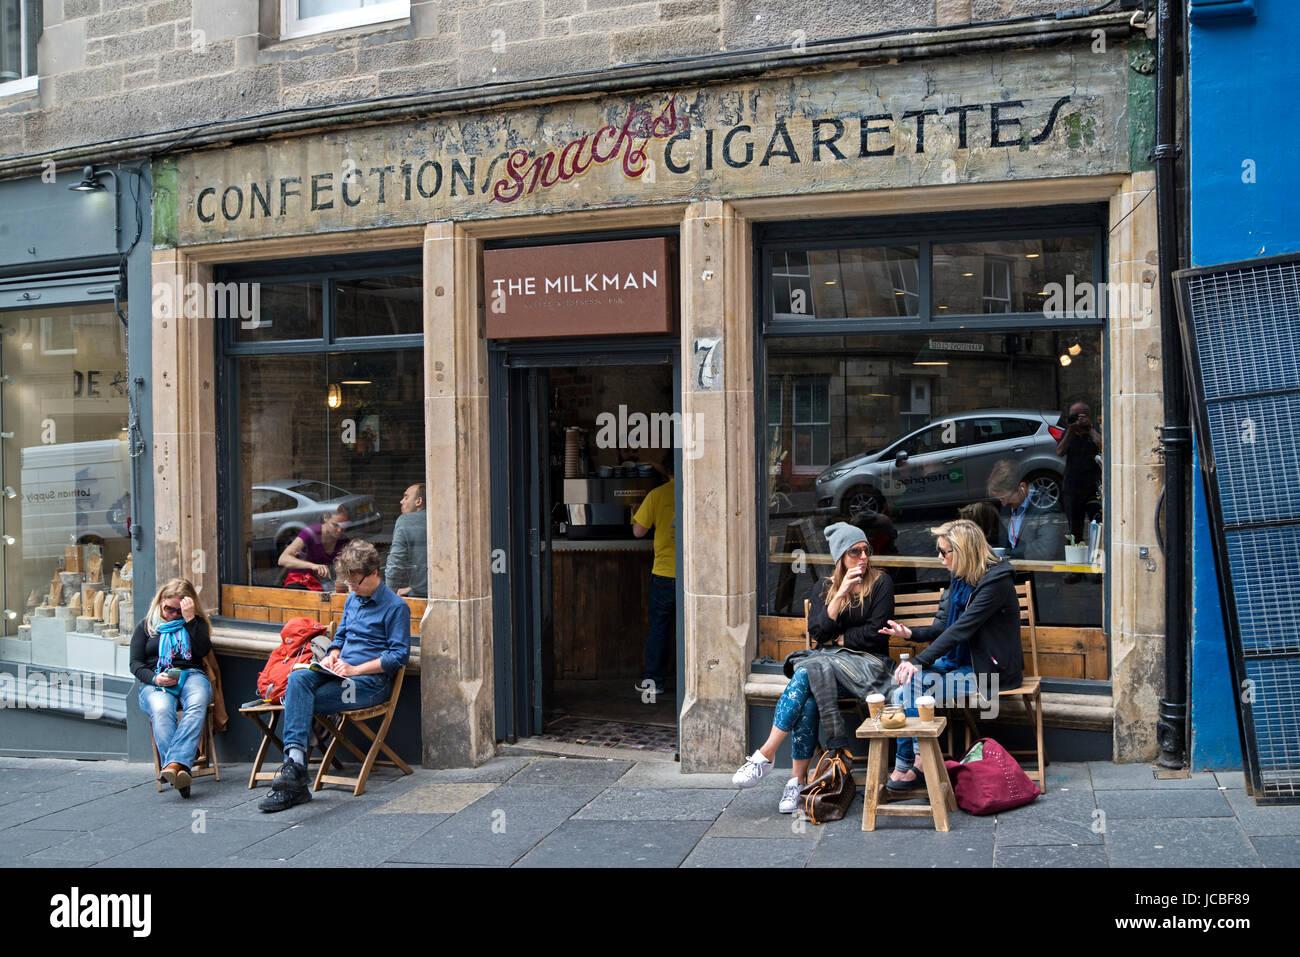 The Milkman A Coffee Shop On Cockburn Street In Edinburgh